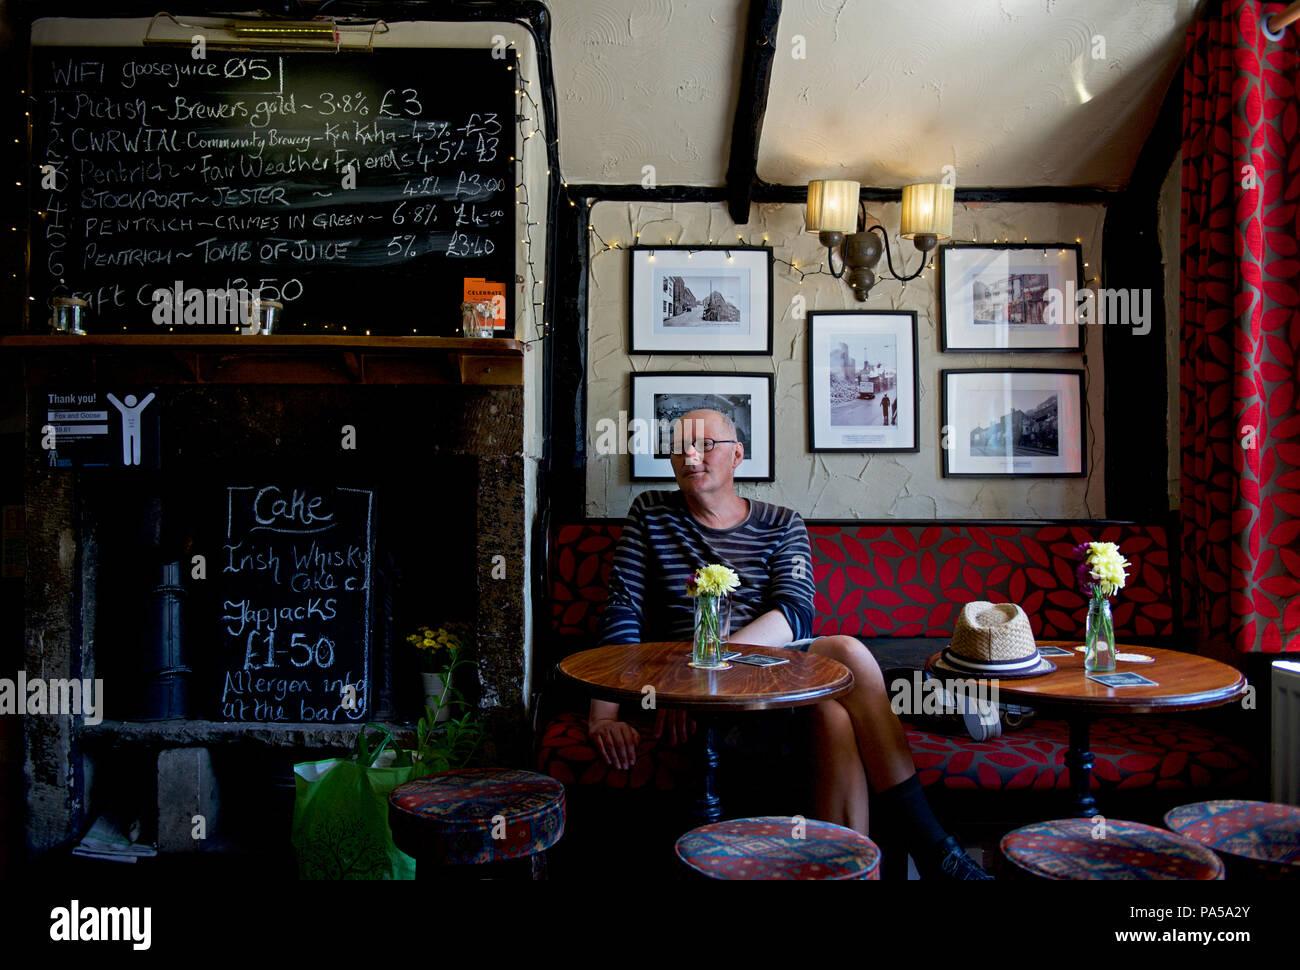 Middle-aged man in the Fox & Goose pub, Hebden Bridge, Calderdale, West Yorkshire, England UK Stock Photo